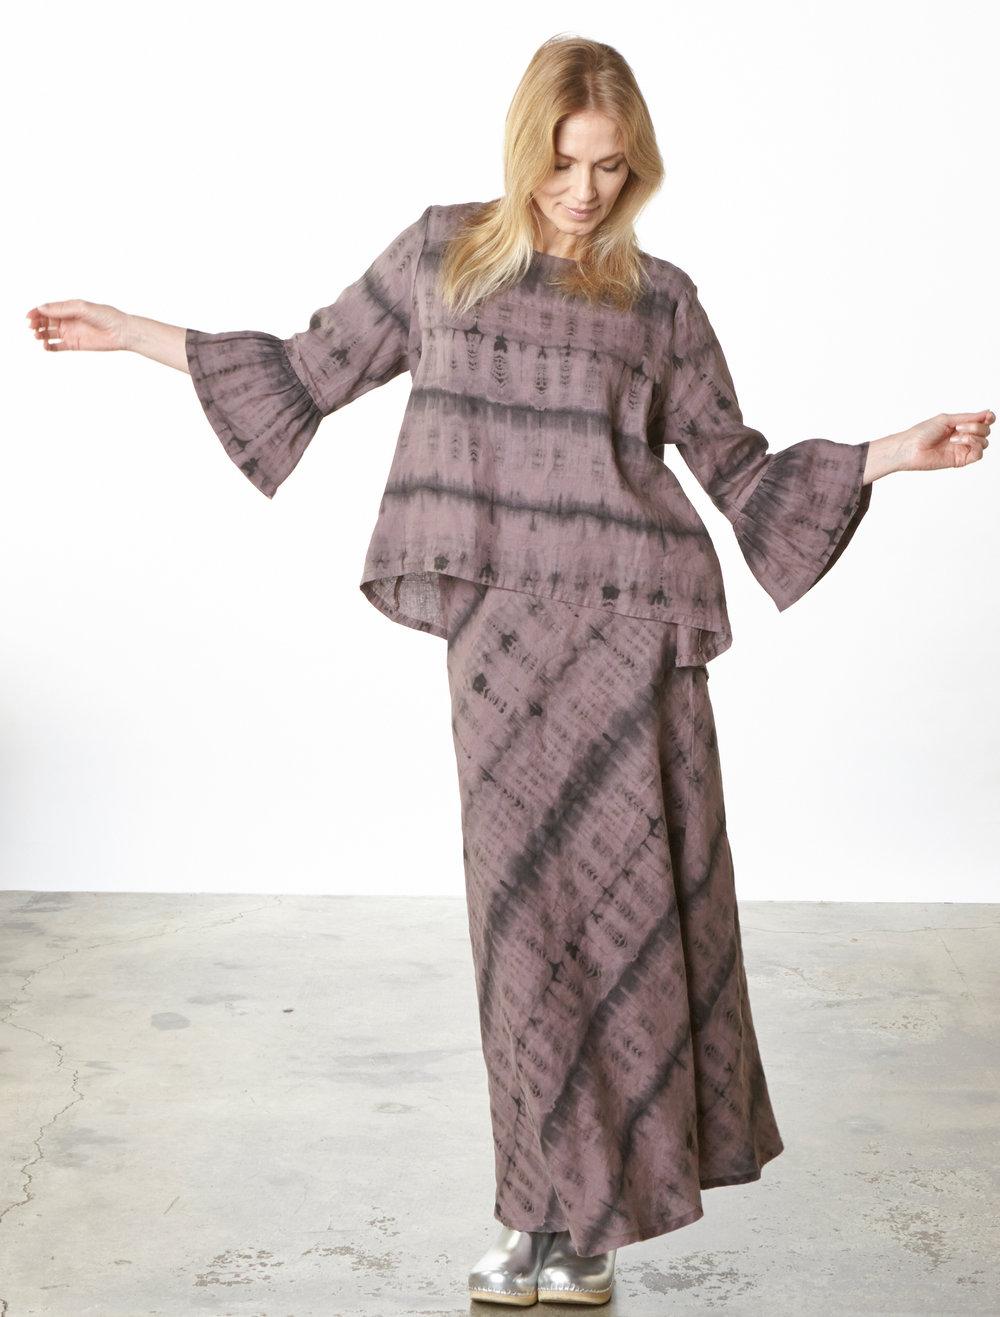 Fran Shirt, Long Bias Skirt in Easel Tie Dye Linen